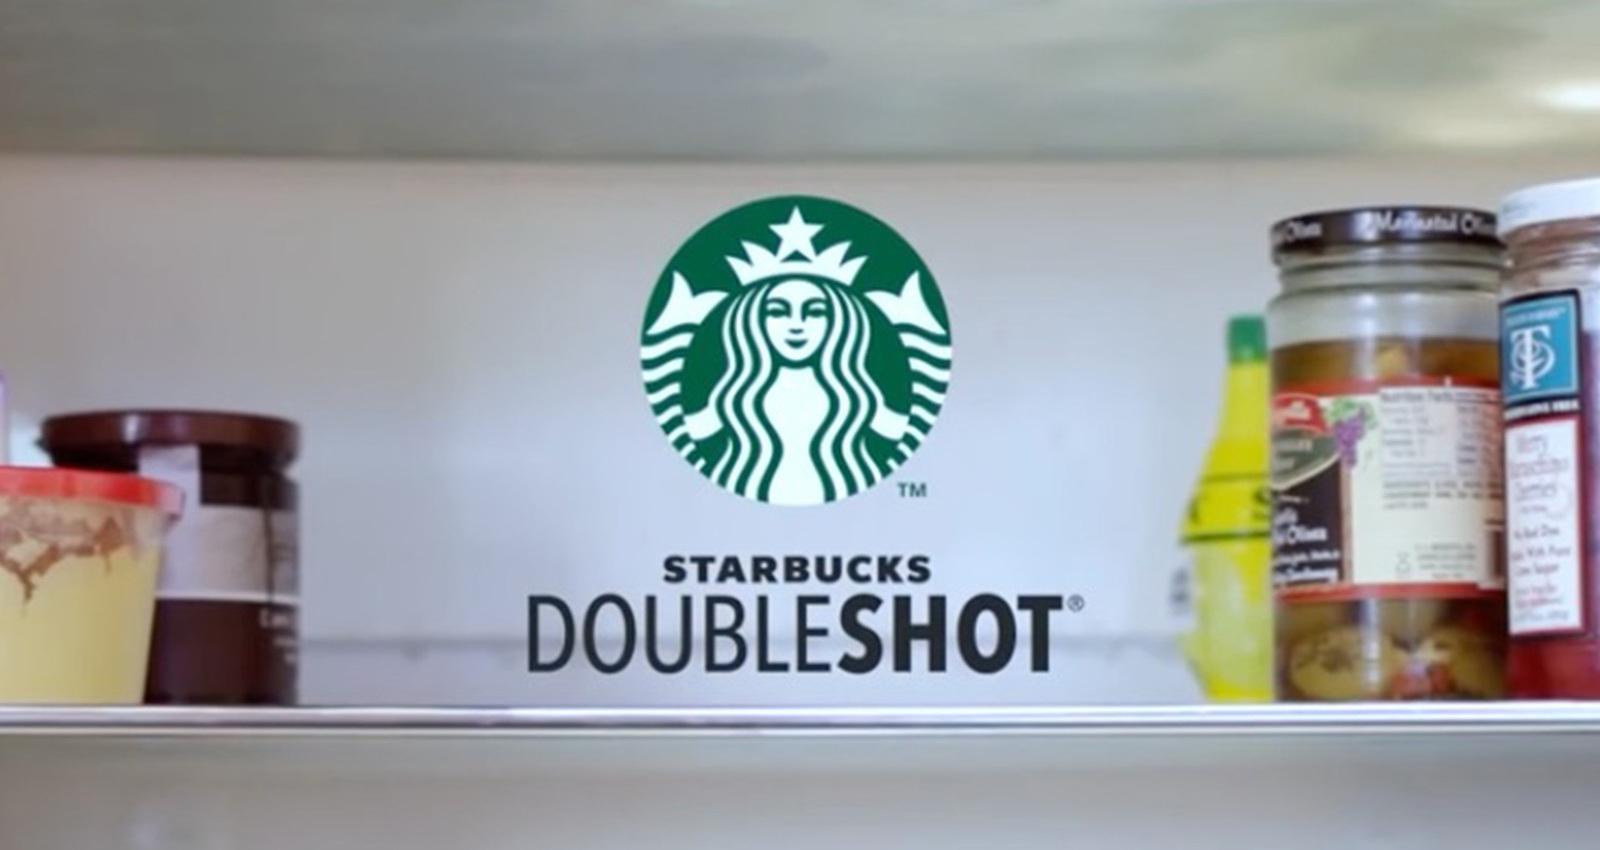 Starbucks Doubleshot Presents: Uploaded